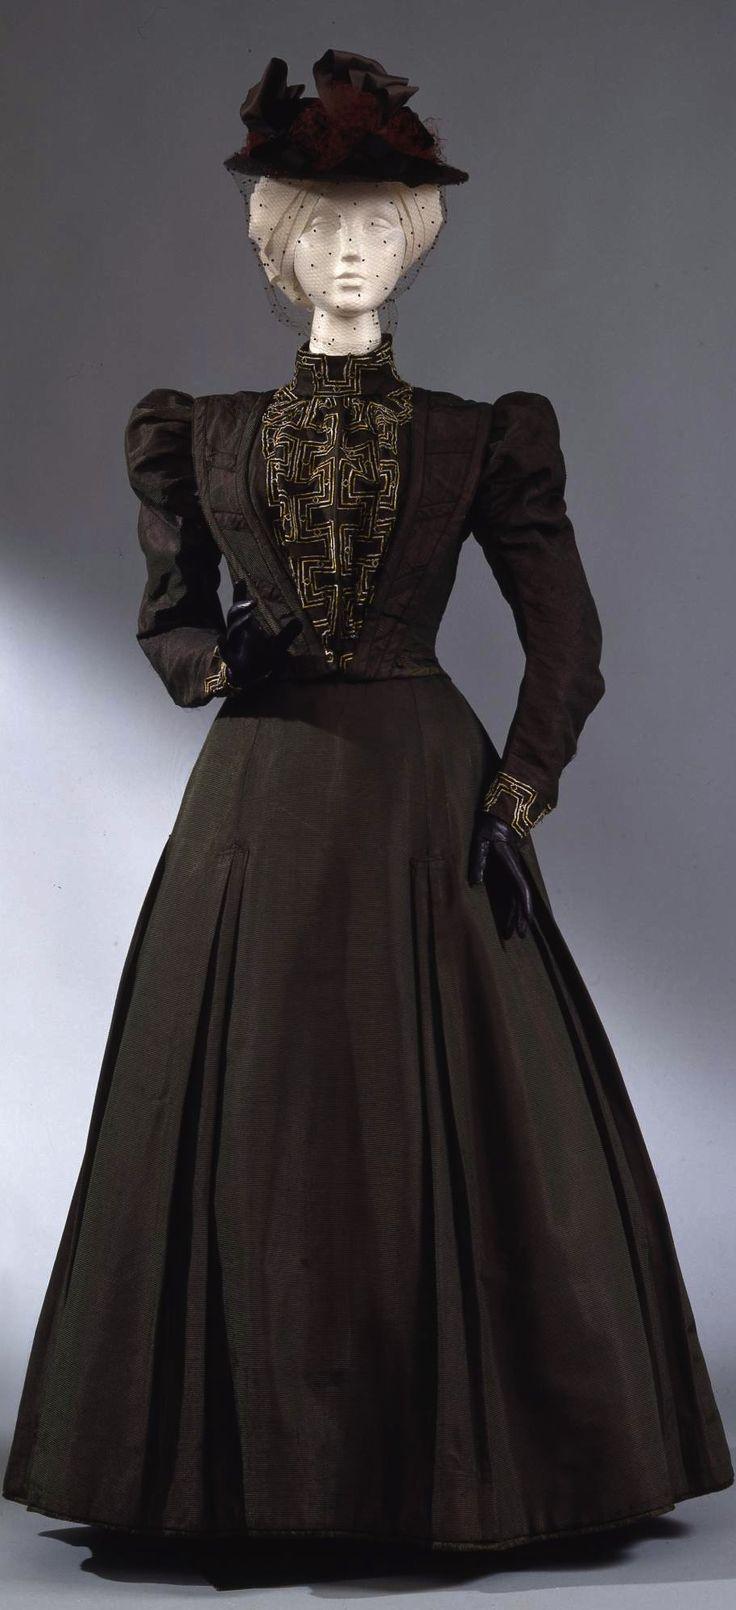 801 Best 1890-1899 Fashion Images On Pinterest  Belle -5496